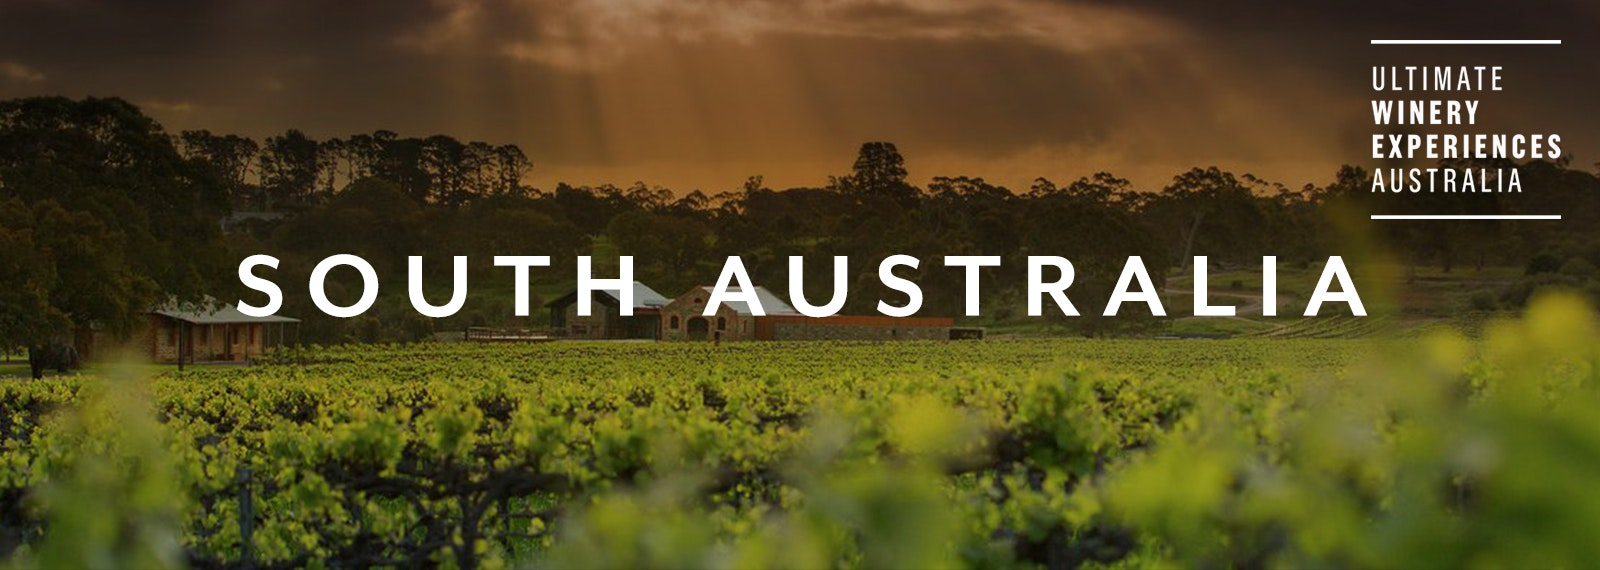 Lexus Of Melbourne >> Ultimate Winery Experiences Australia - South Australia